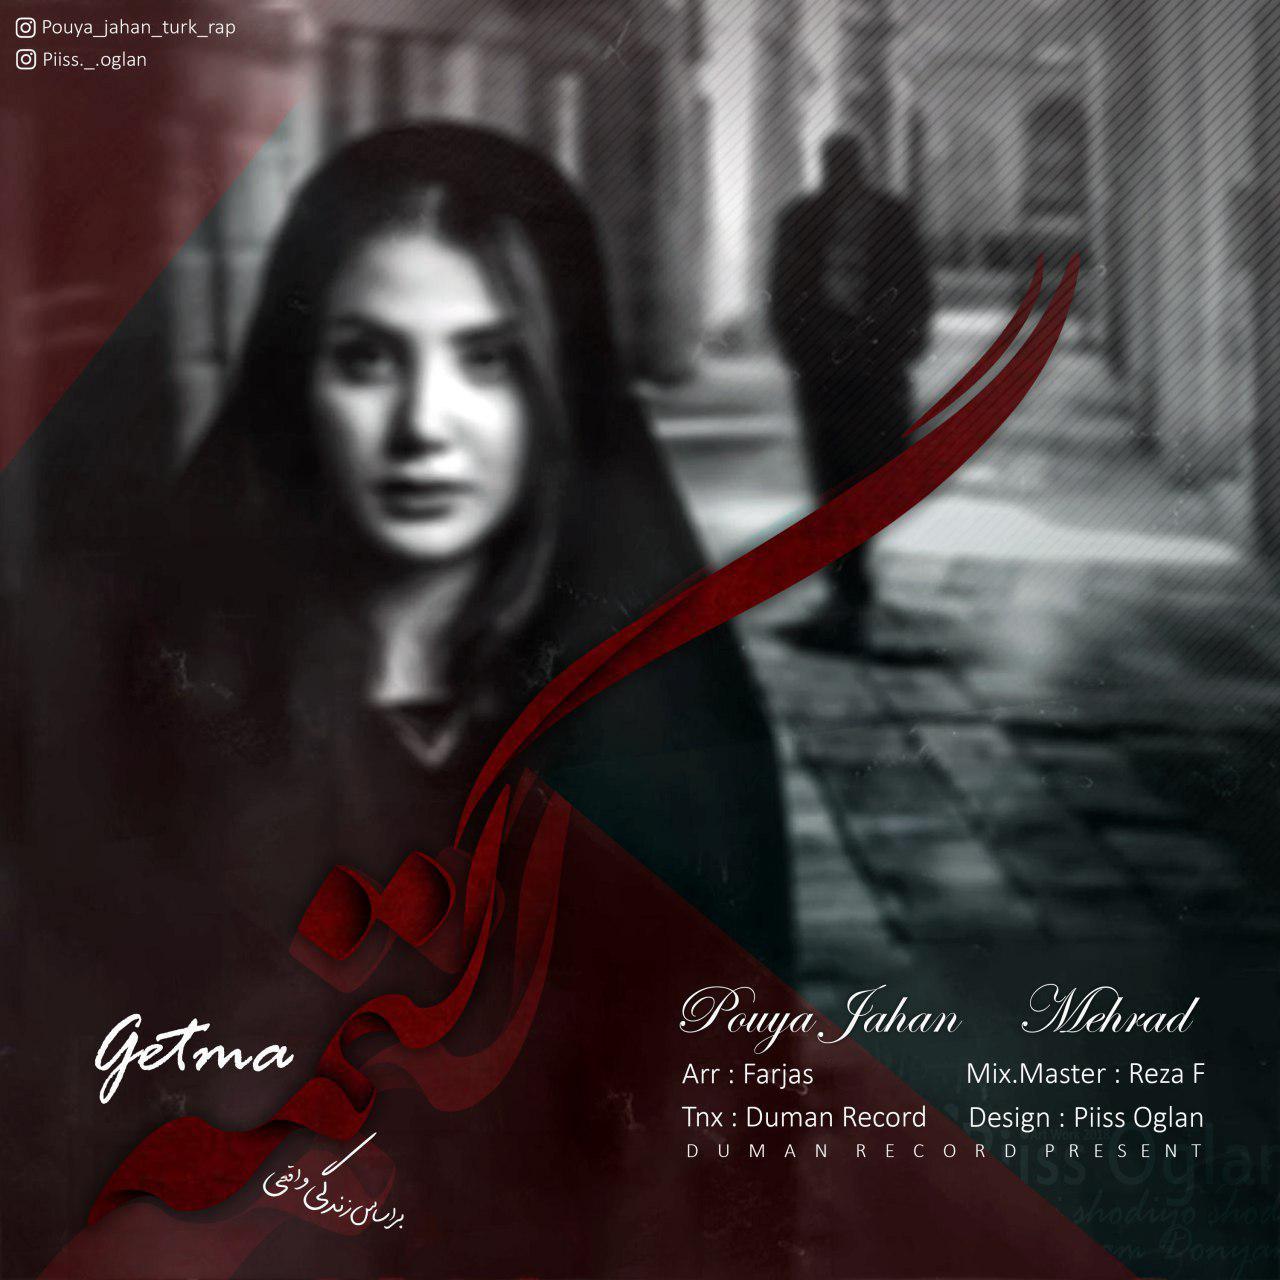 http://s9.picofile.com/file/8360235868/17Pouya_Jahan_Feat_Mehrdad_Getma.jpg